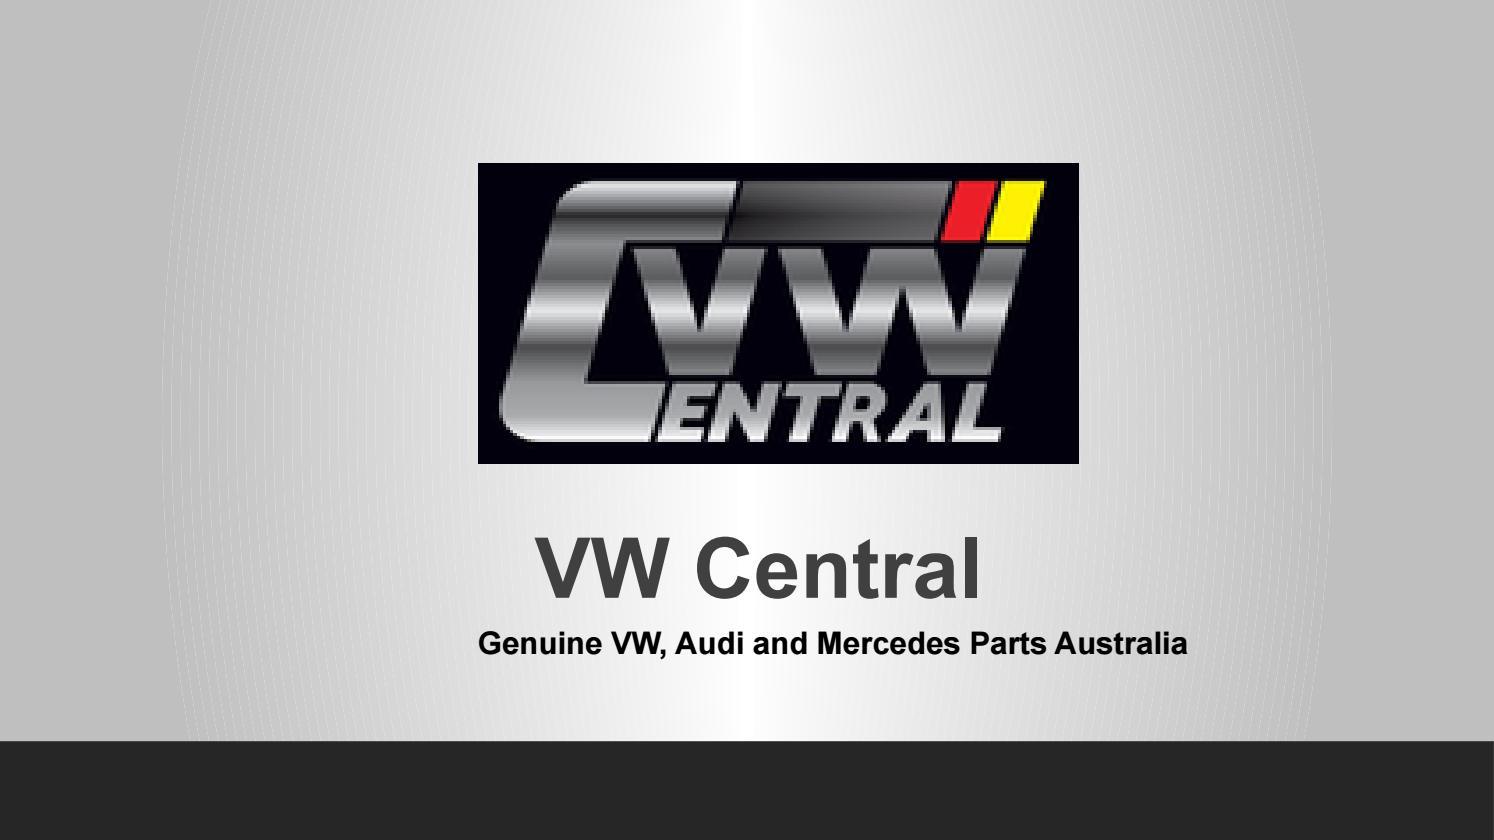 Mercedes Benz Parts Online >> Shop Audi Volkswagen Mercedes Benz Parts Online Vwcentral By Vw